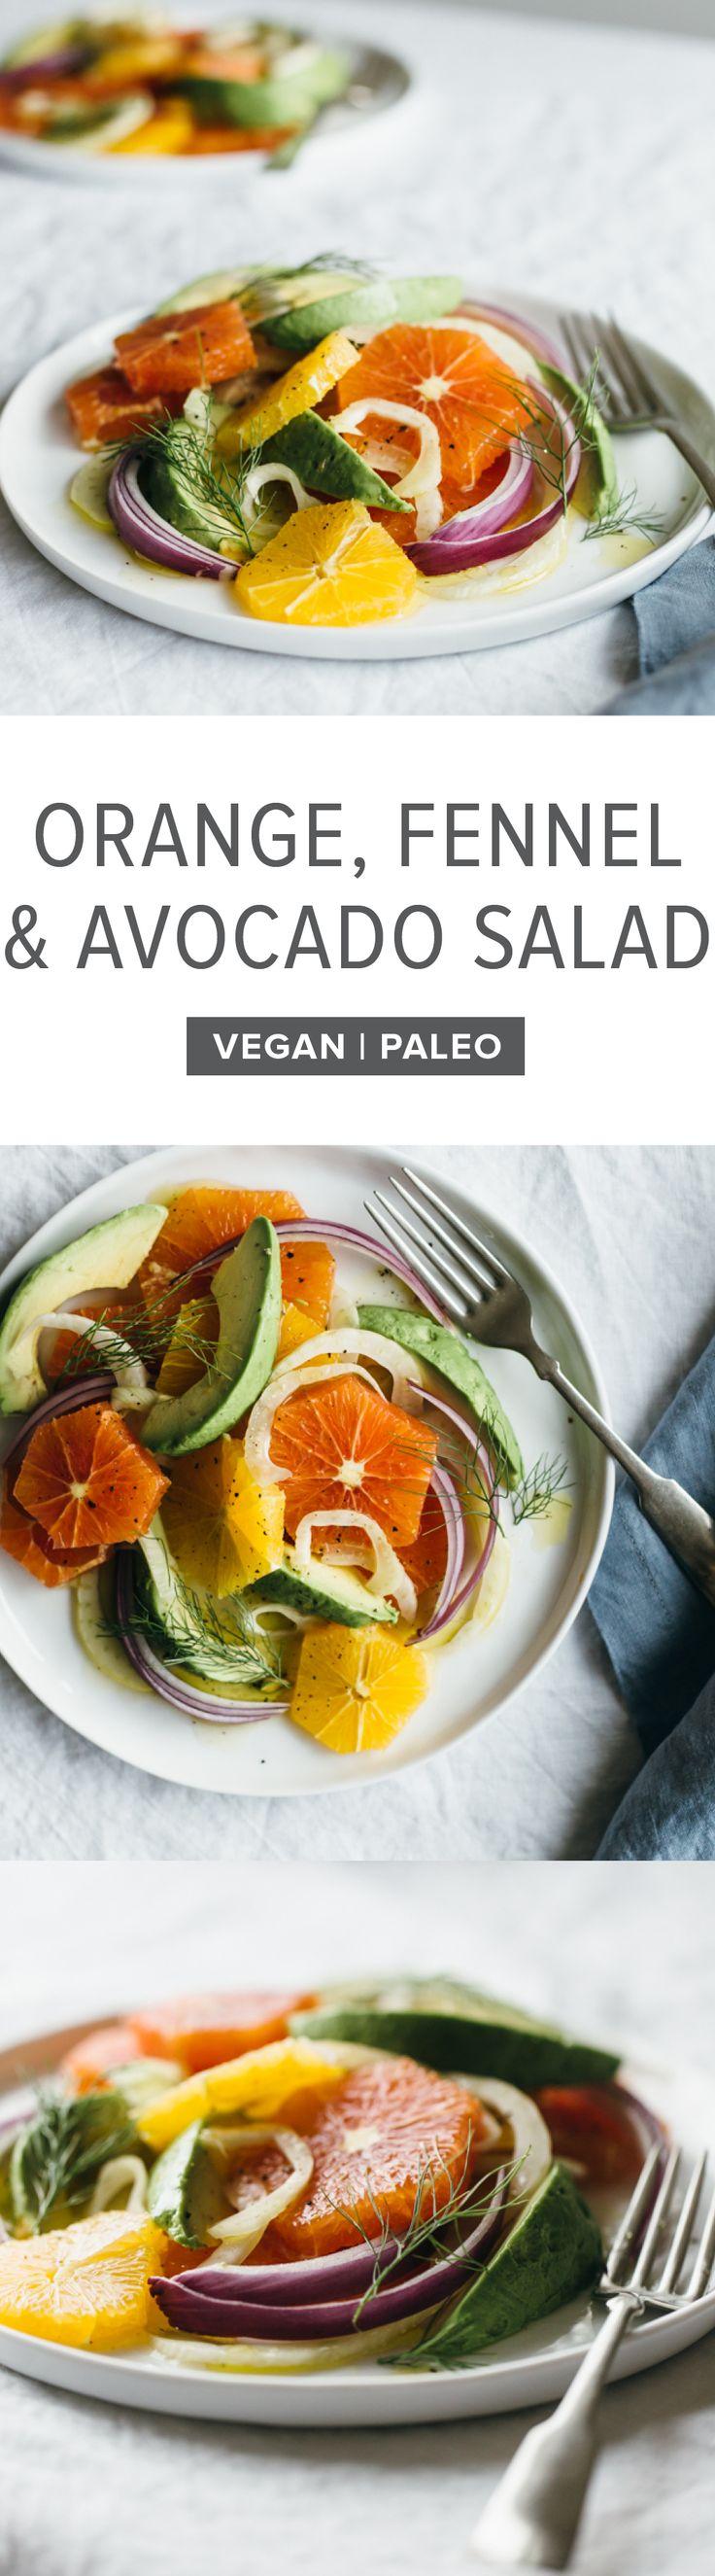 Orange, fennel and avocado salad with a white wine vinaigrette.